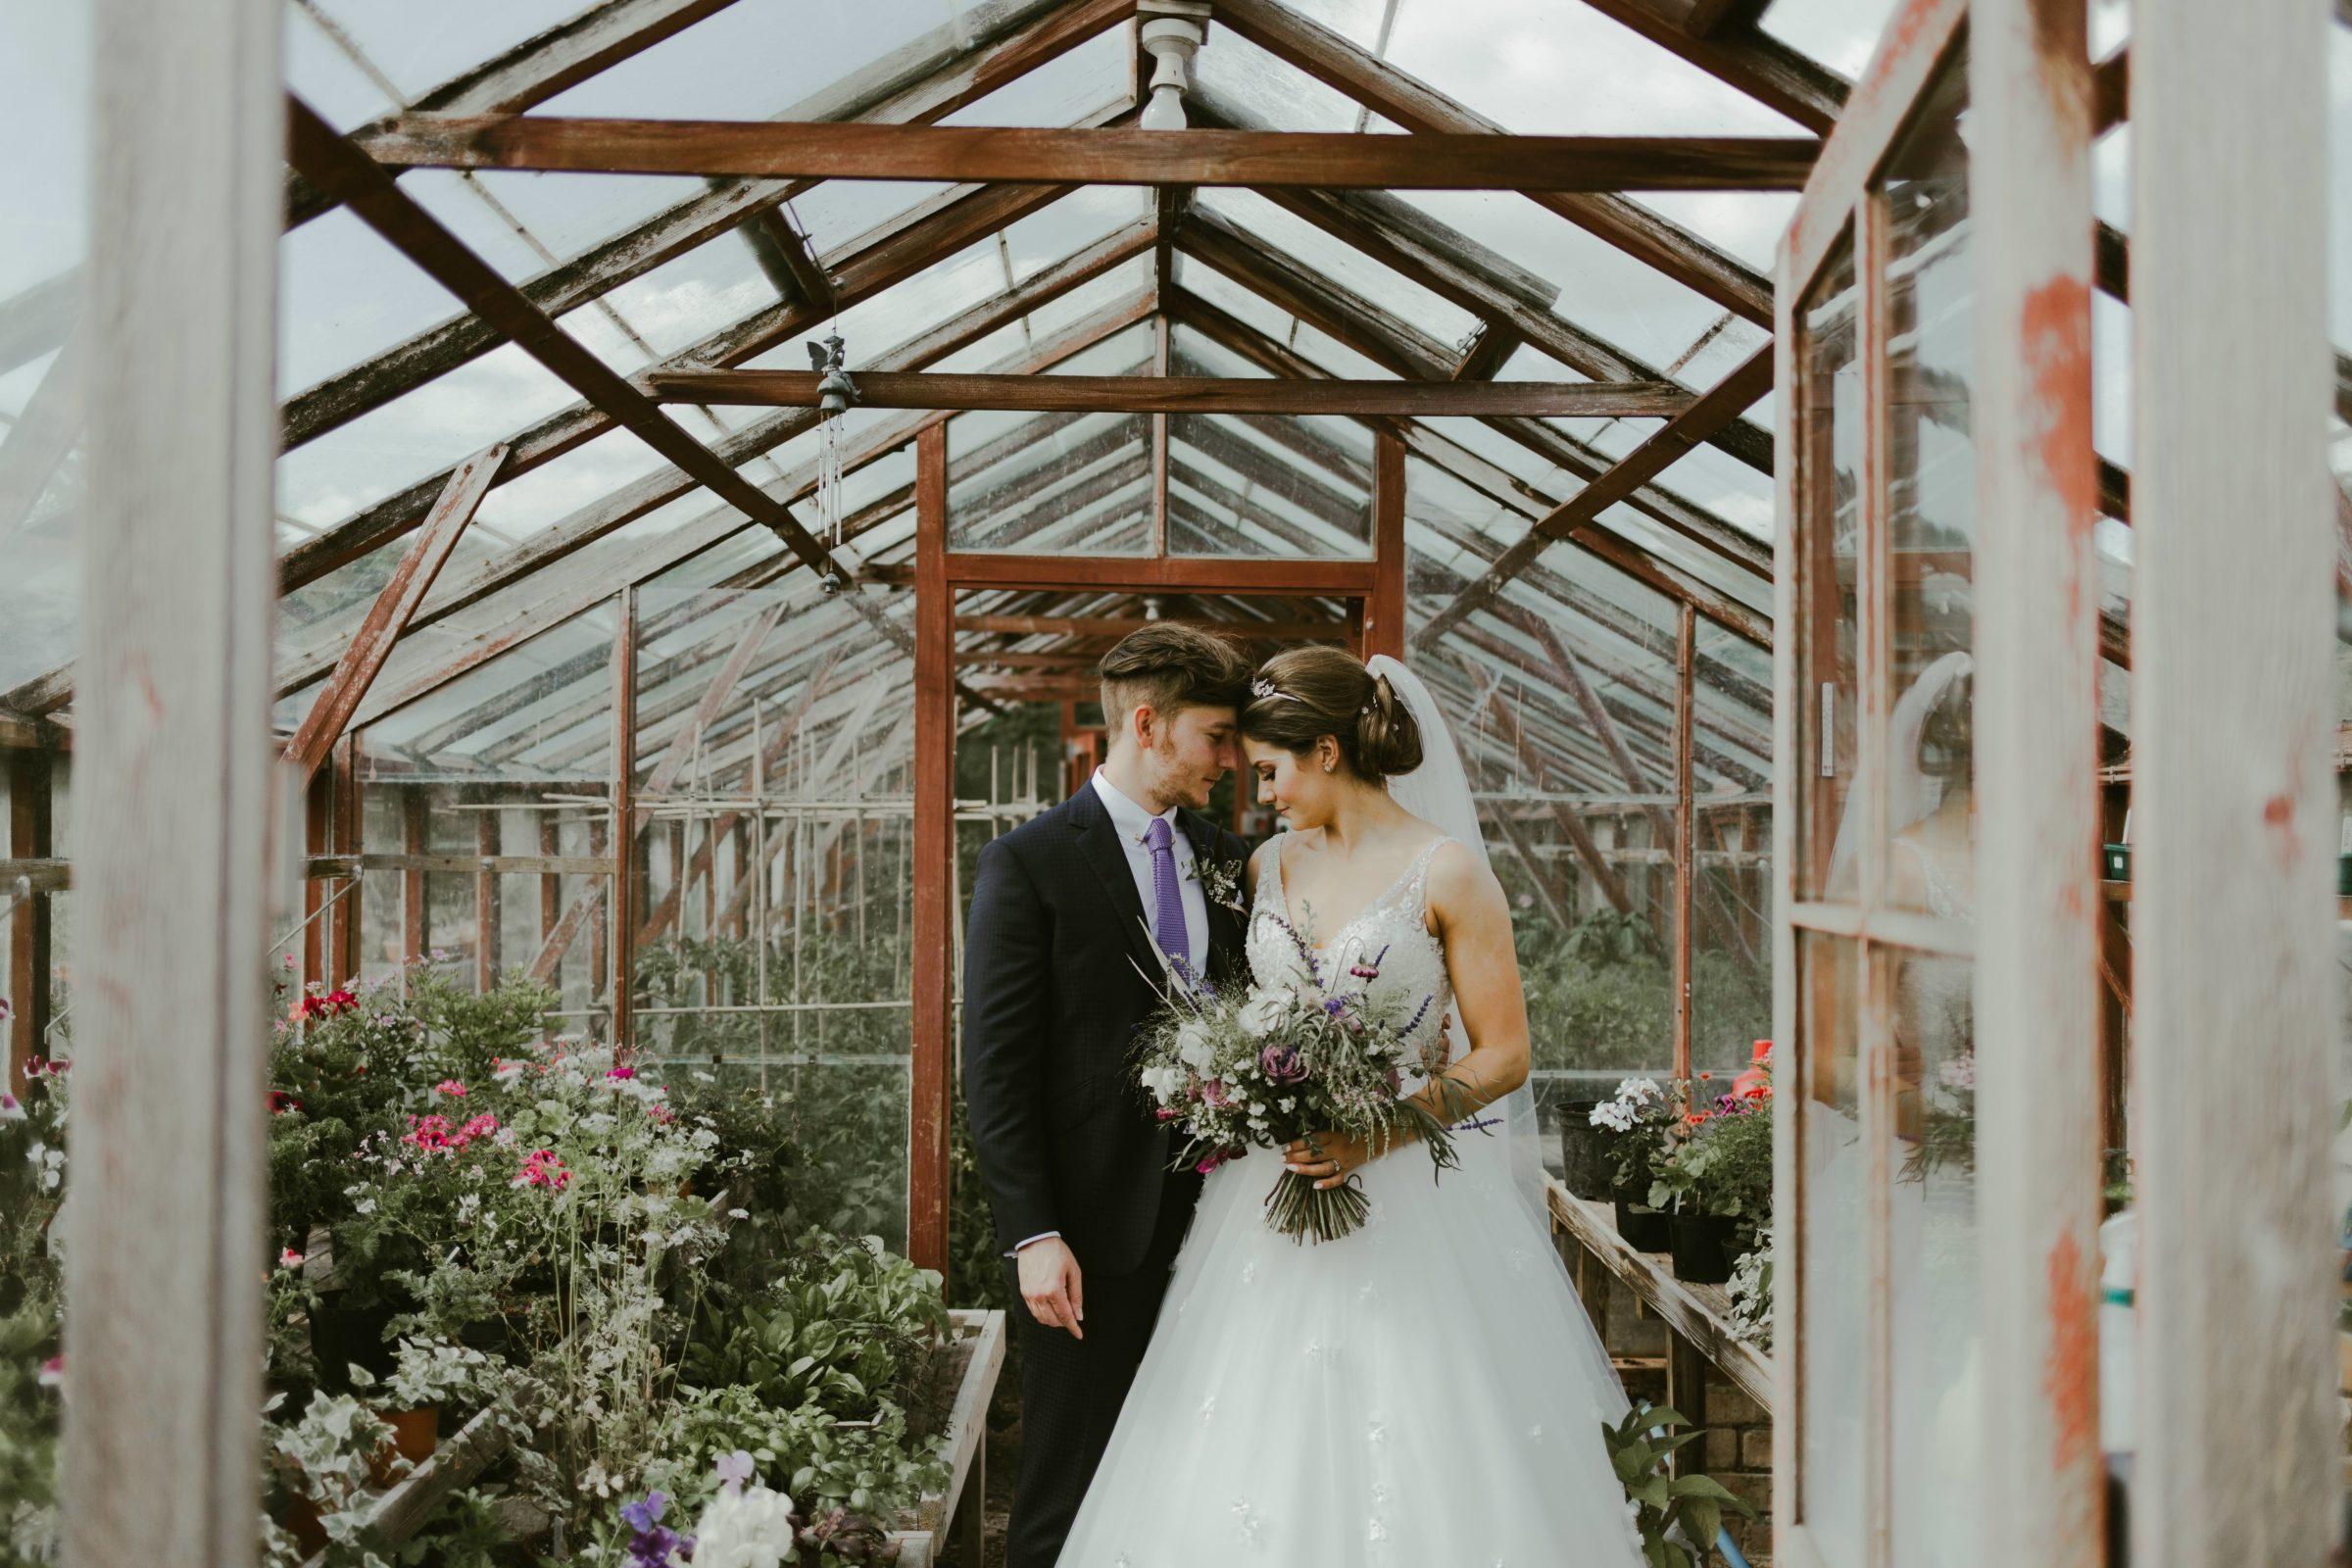 birtsmorton-court-wedding-venue-malvern-uk-photography-photographer-couple-summer